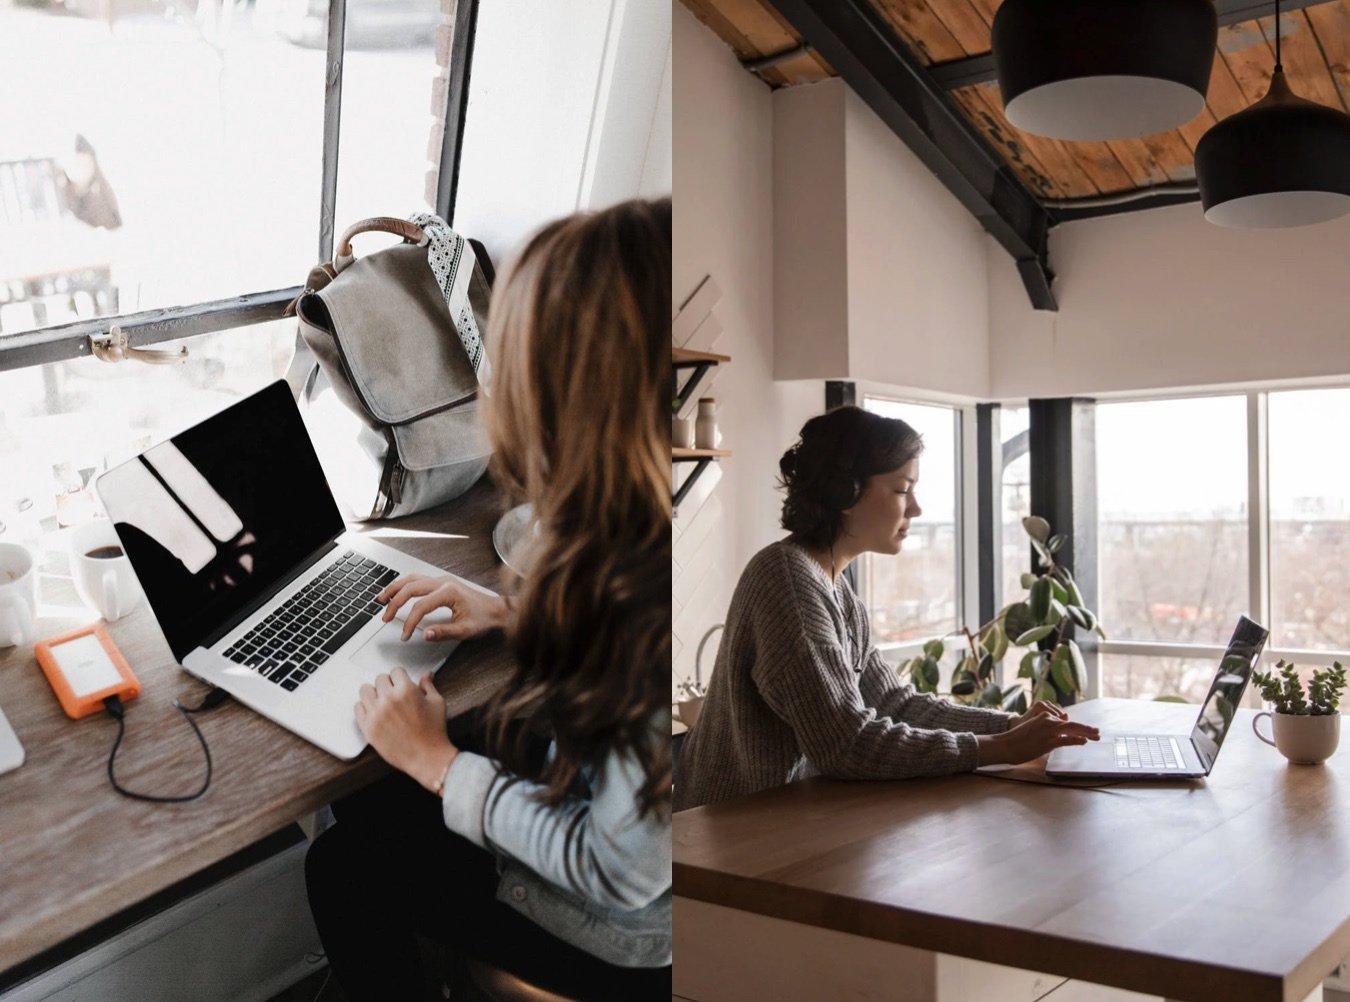 Retrofitting Window Film Offers 3 Interesting Benefits For Homes & Offices in Iowa City, Iowa